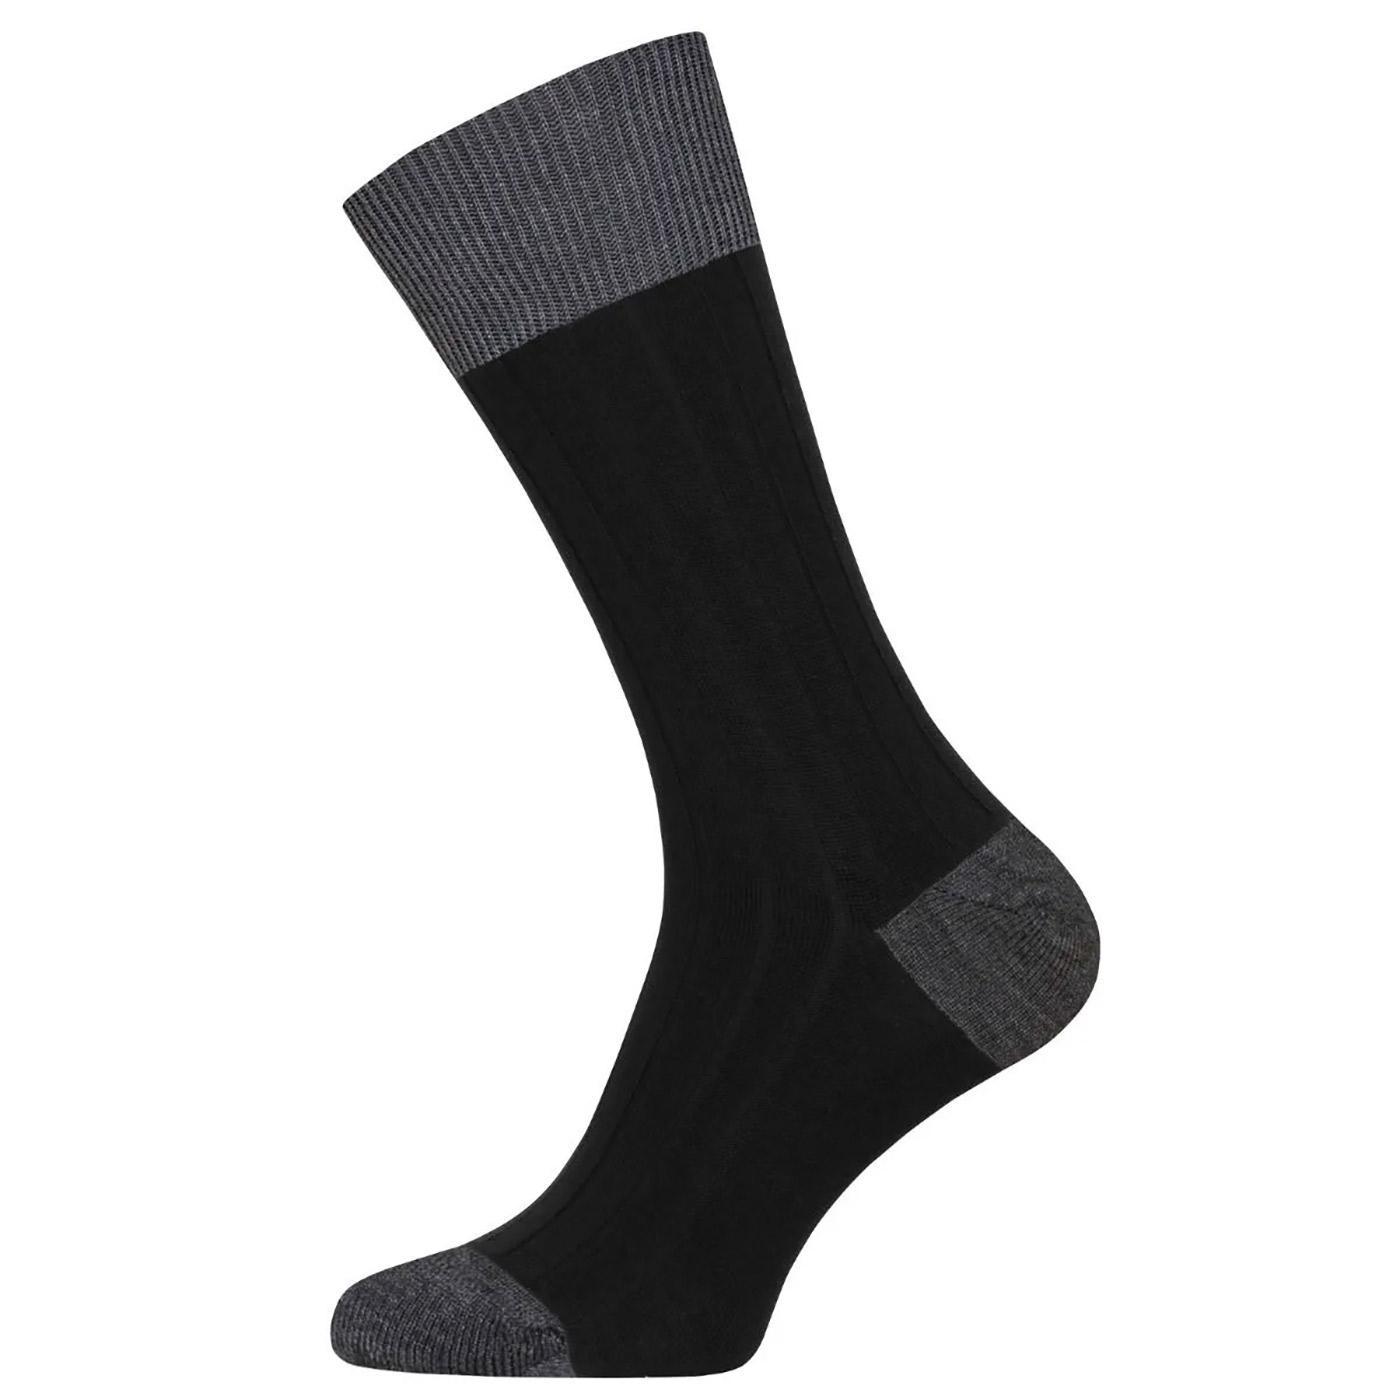 Gamma JOHN SMEDLEY Colour Block Ribbed Socks (B/C)